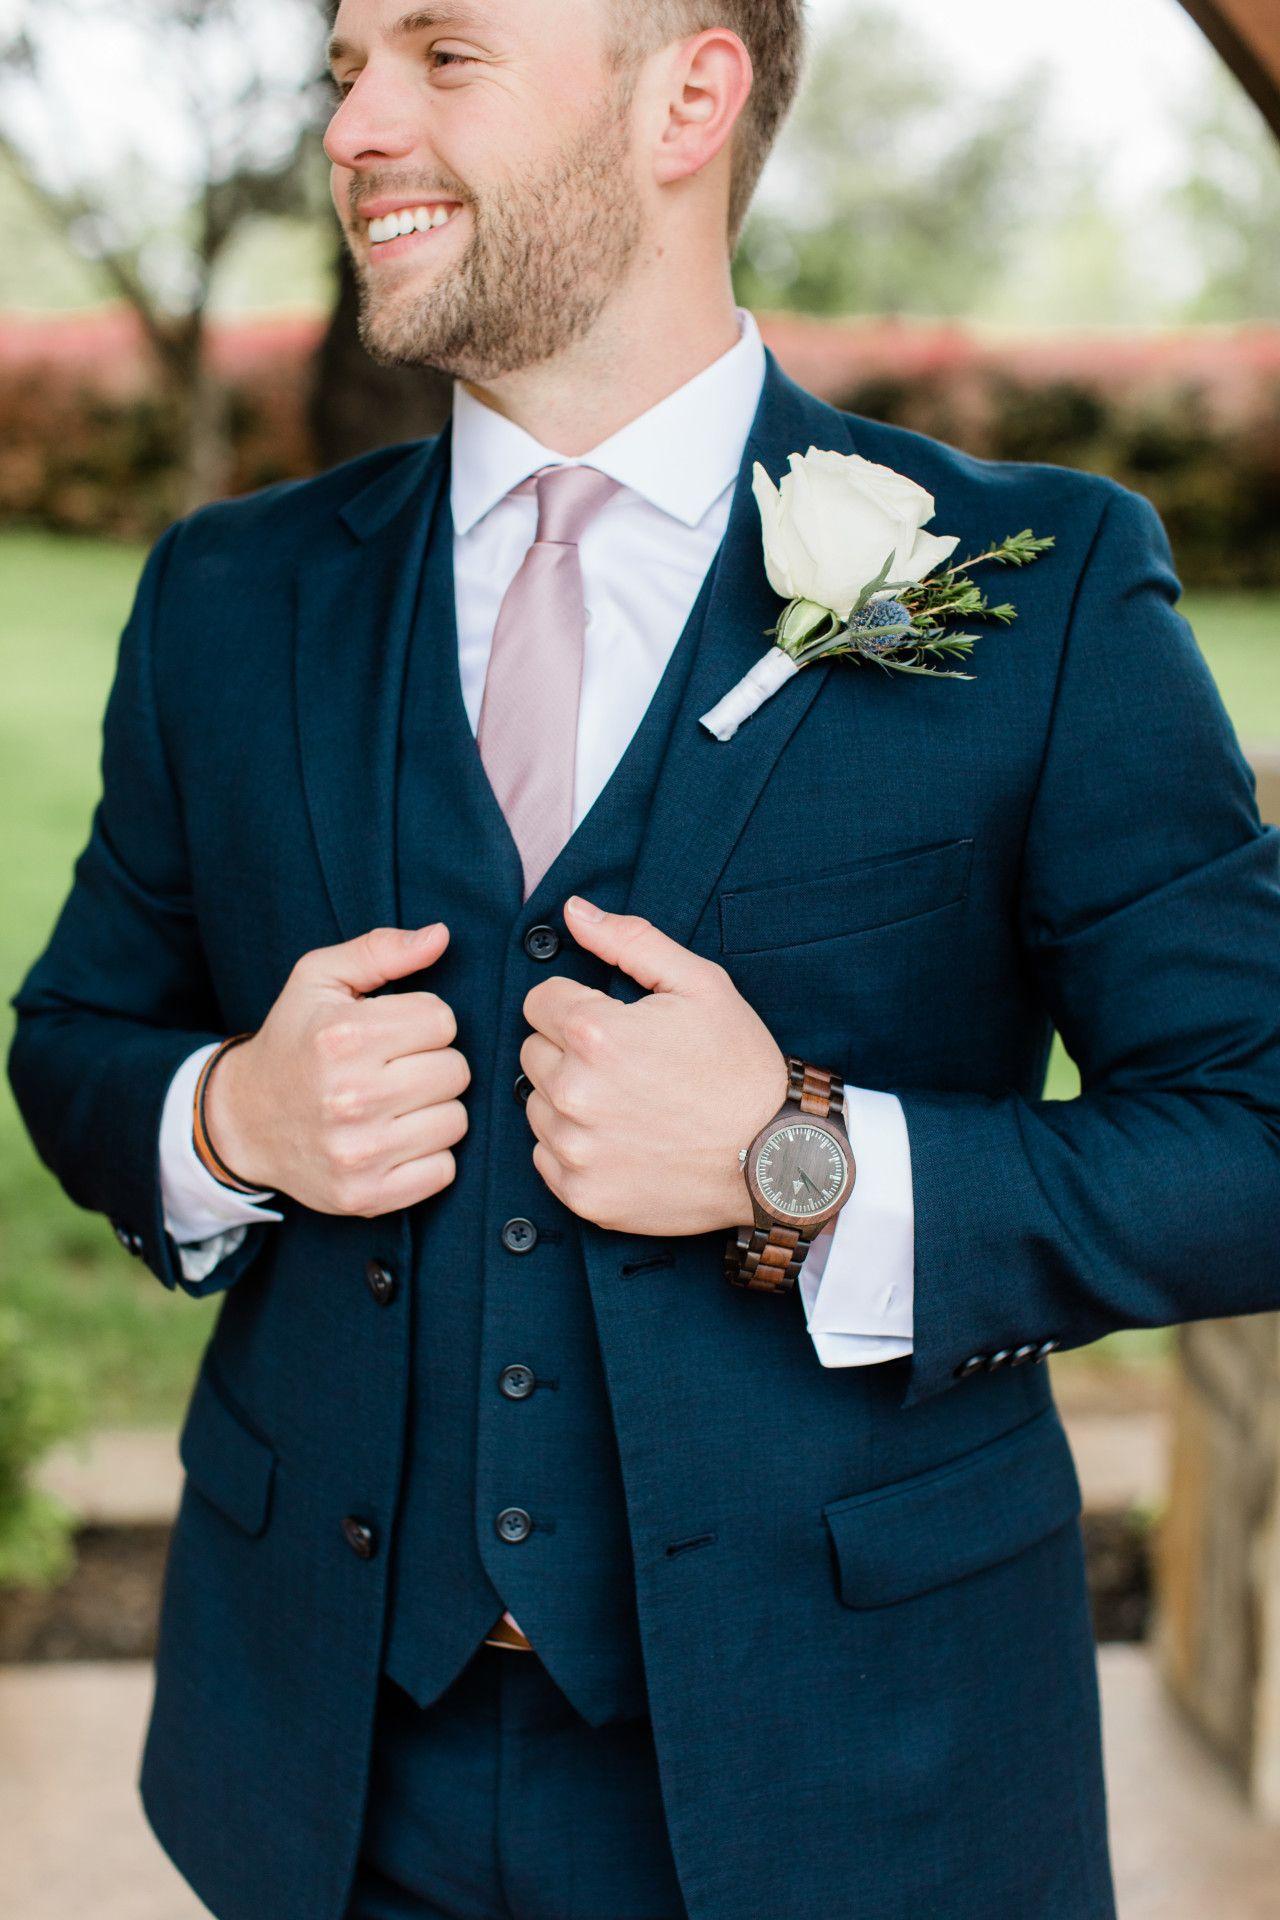 Groom In Navy Blue Groom With A Lavender Tie Spring Groom Attire Classy Spring Wedding Groo Groom Wedding Attire Navy Blue Groom Navy Blue Suit Wedding